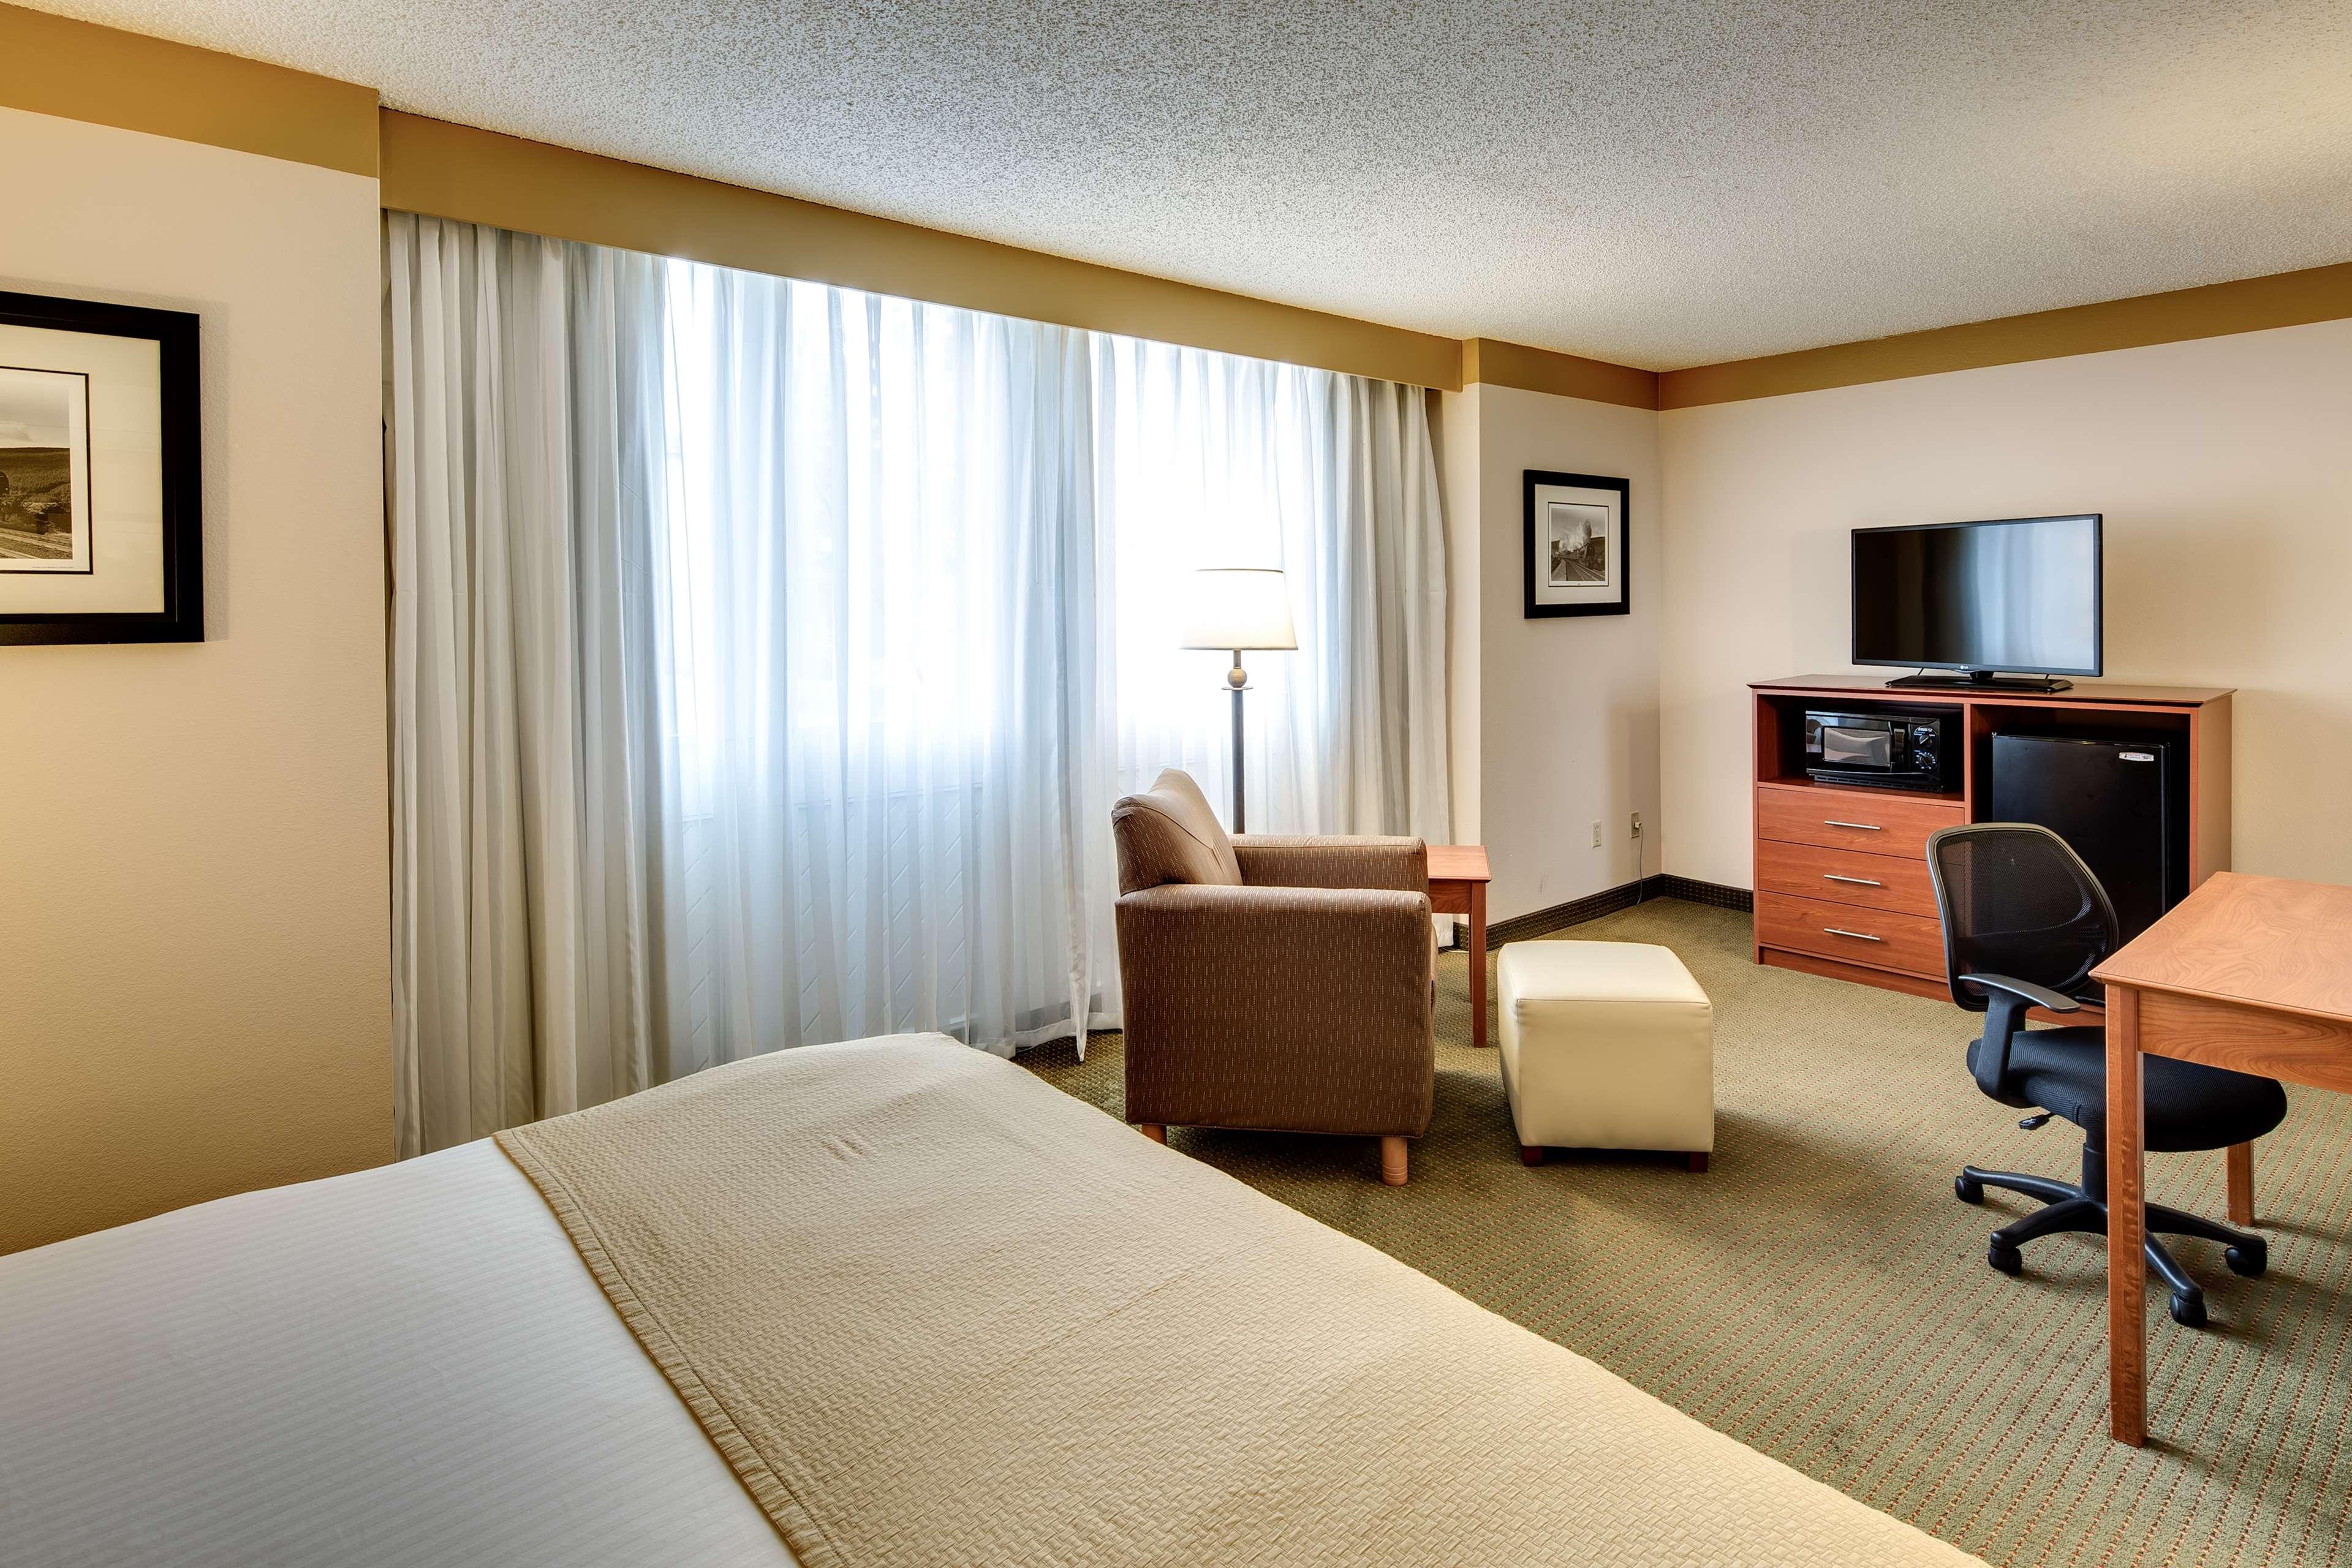 Best Western Plus Como Park Hotel image 20